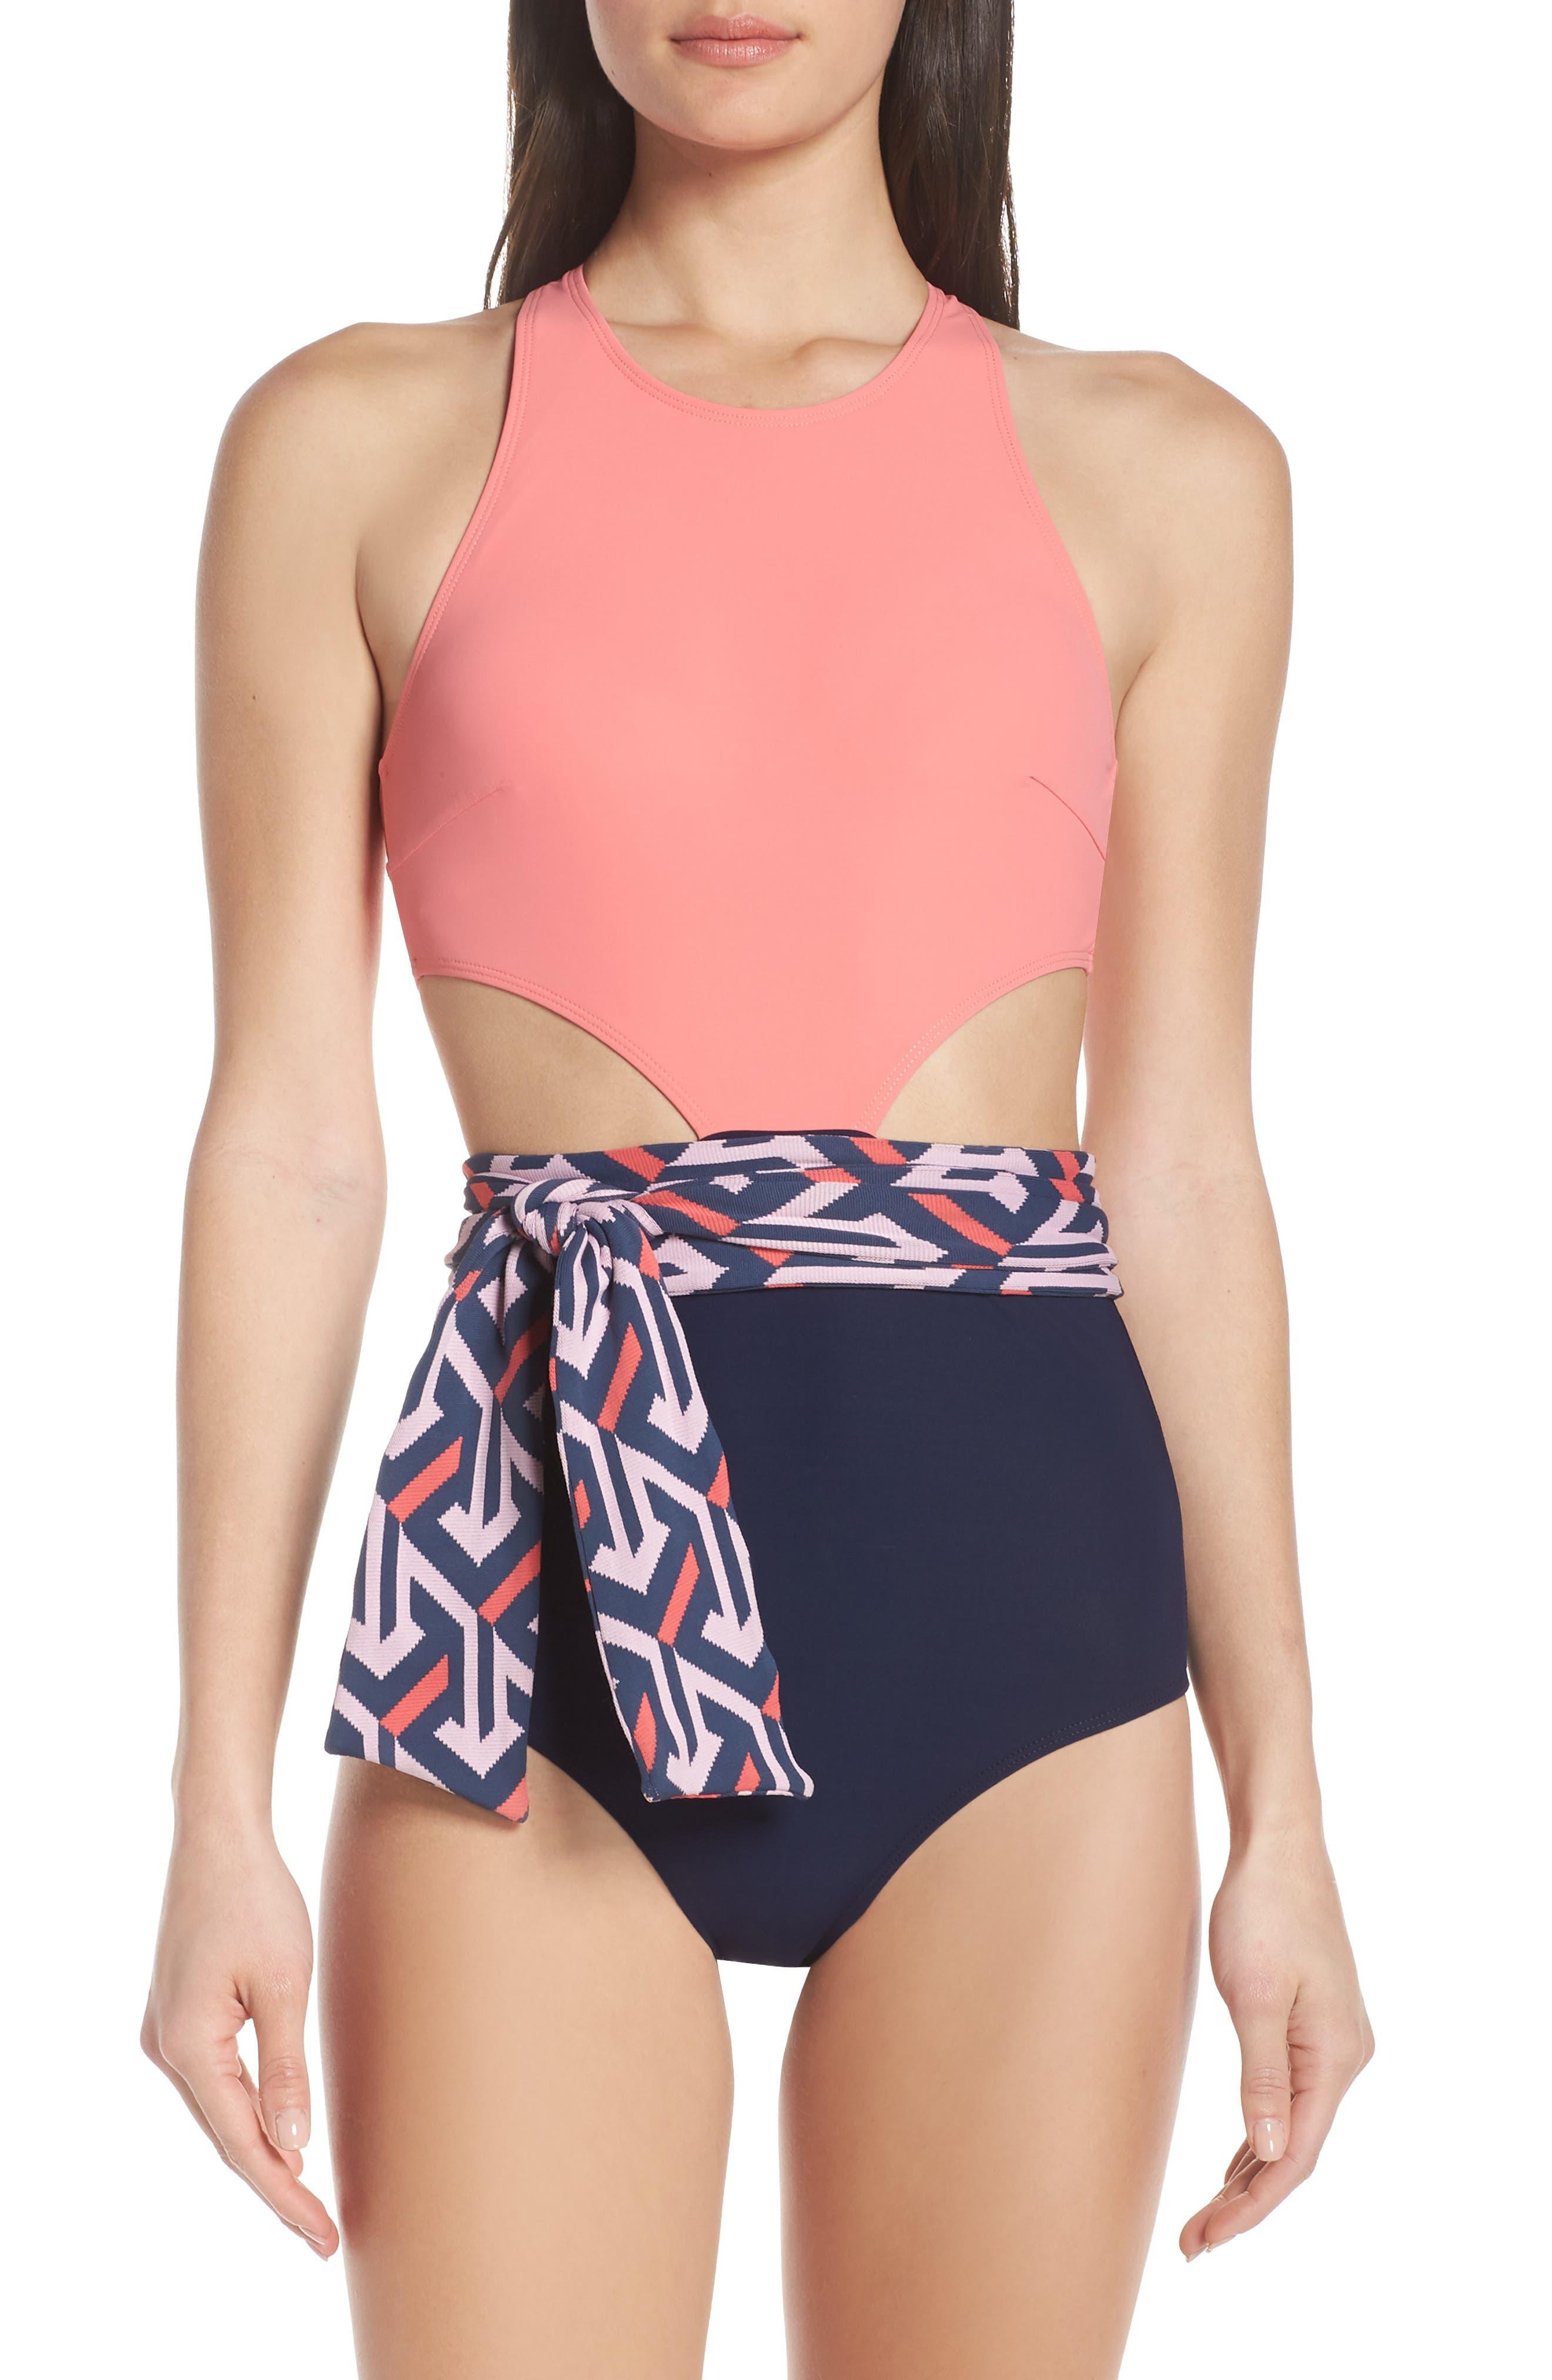 Flagpole Lynn One-Piece Sash Swimsuit, Coral